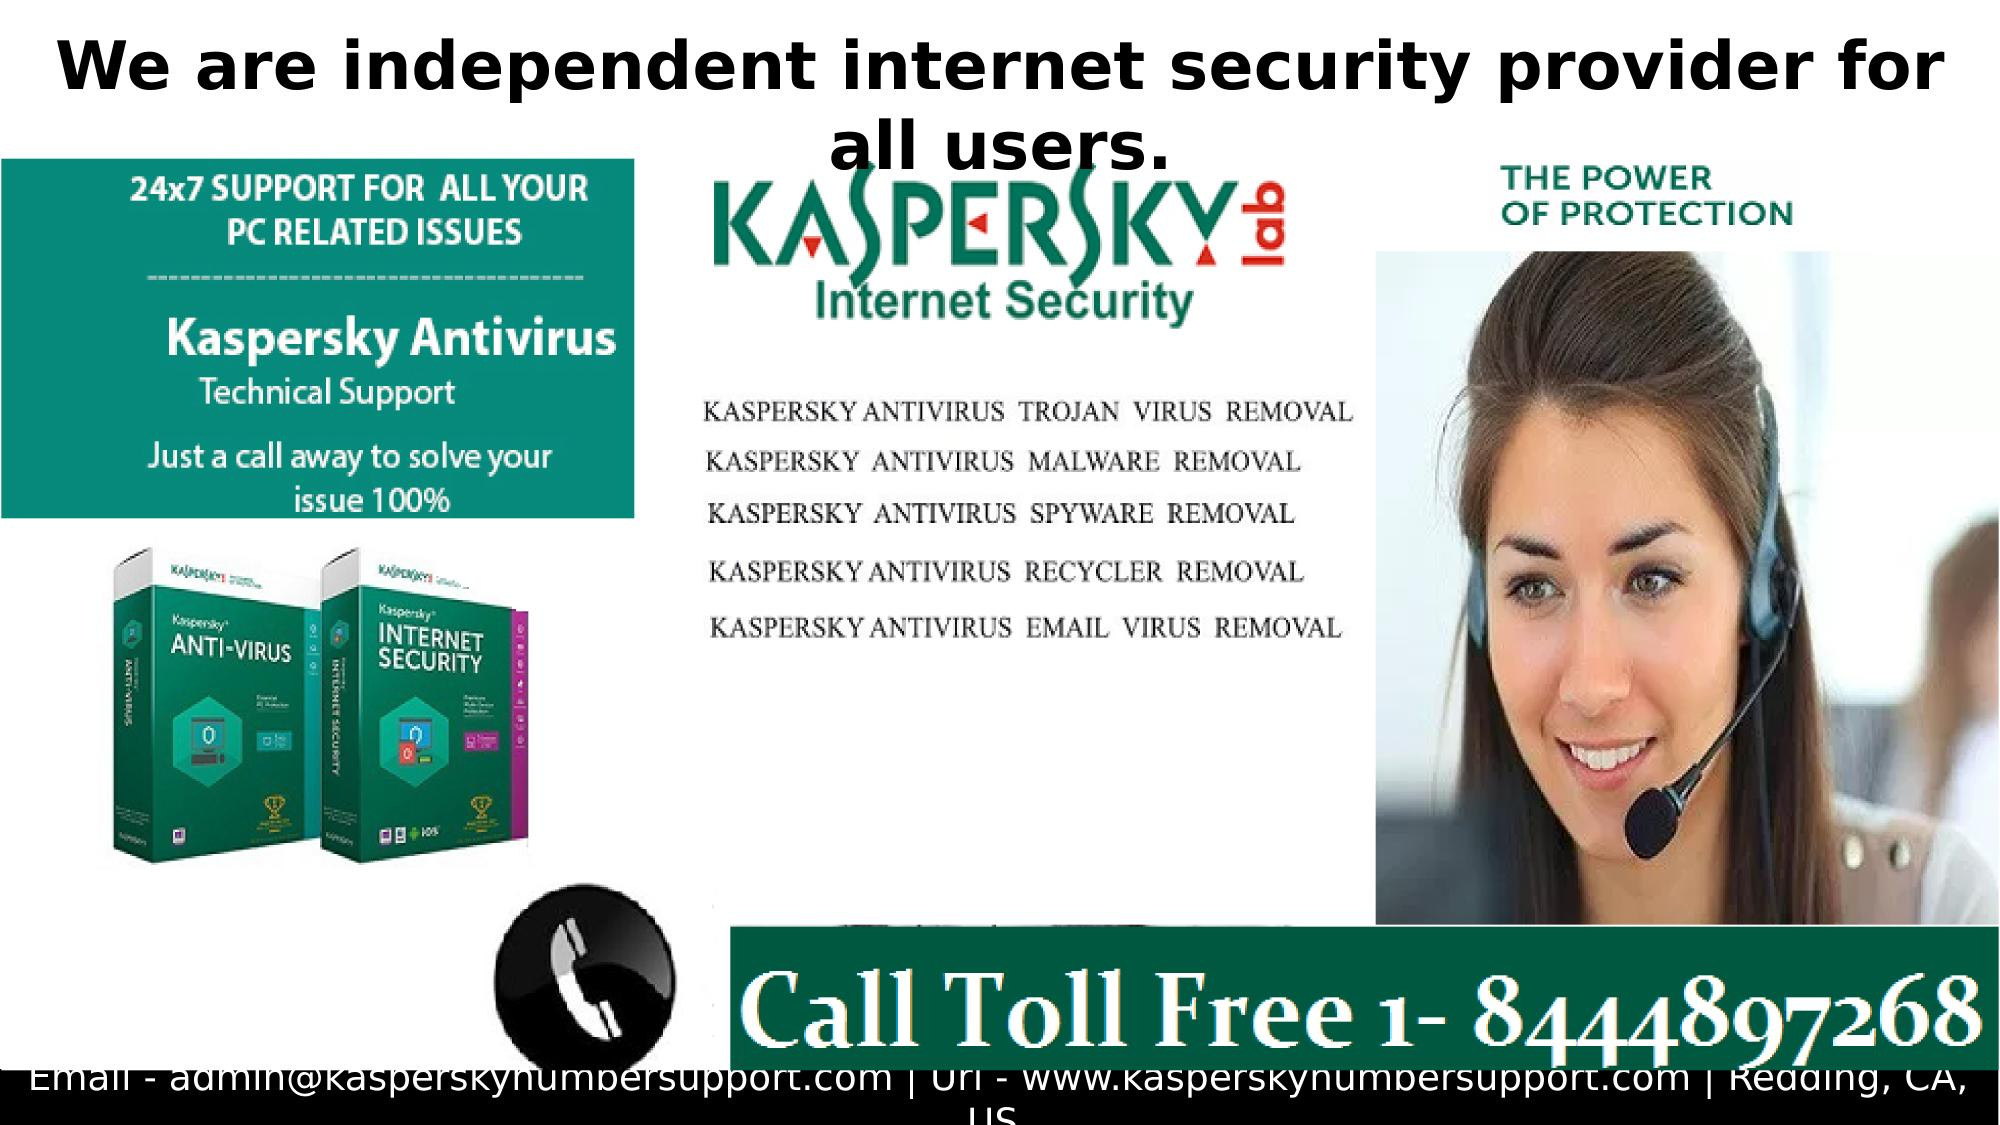 kaspersky antivirus support Number 1-8444897268 ( Toll Free )